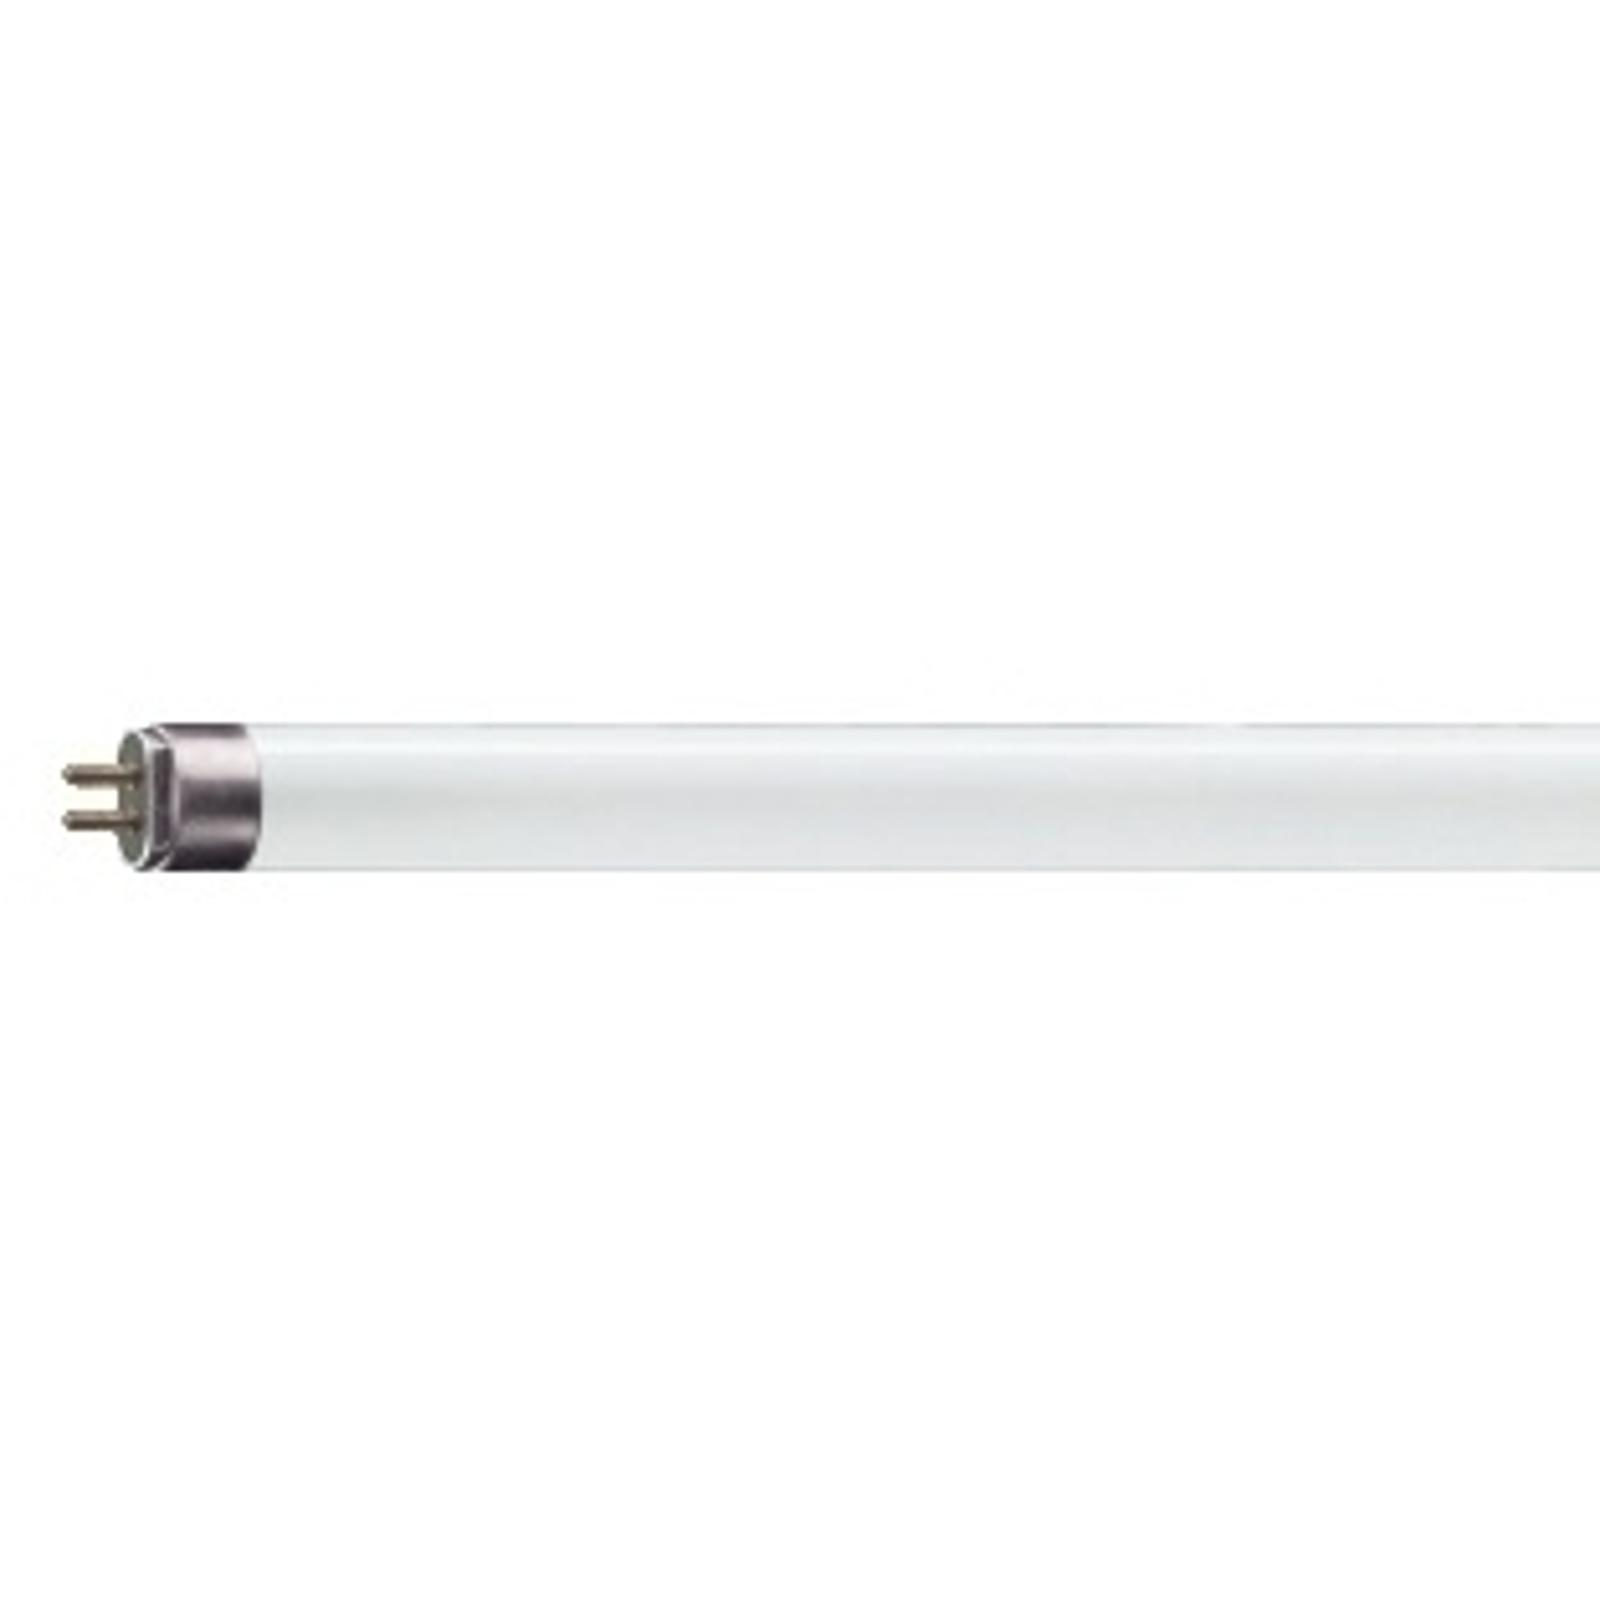 Philips Master G5 T5 Mini Leuchtstoffröhre 8W 640